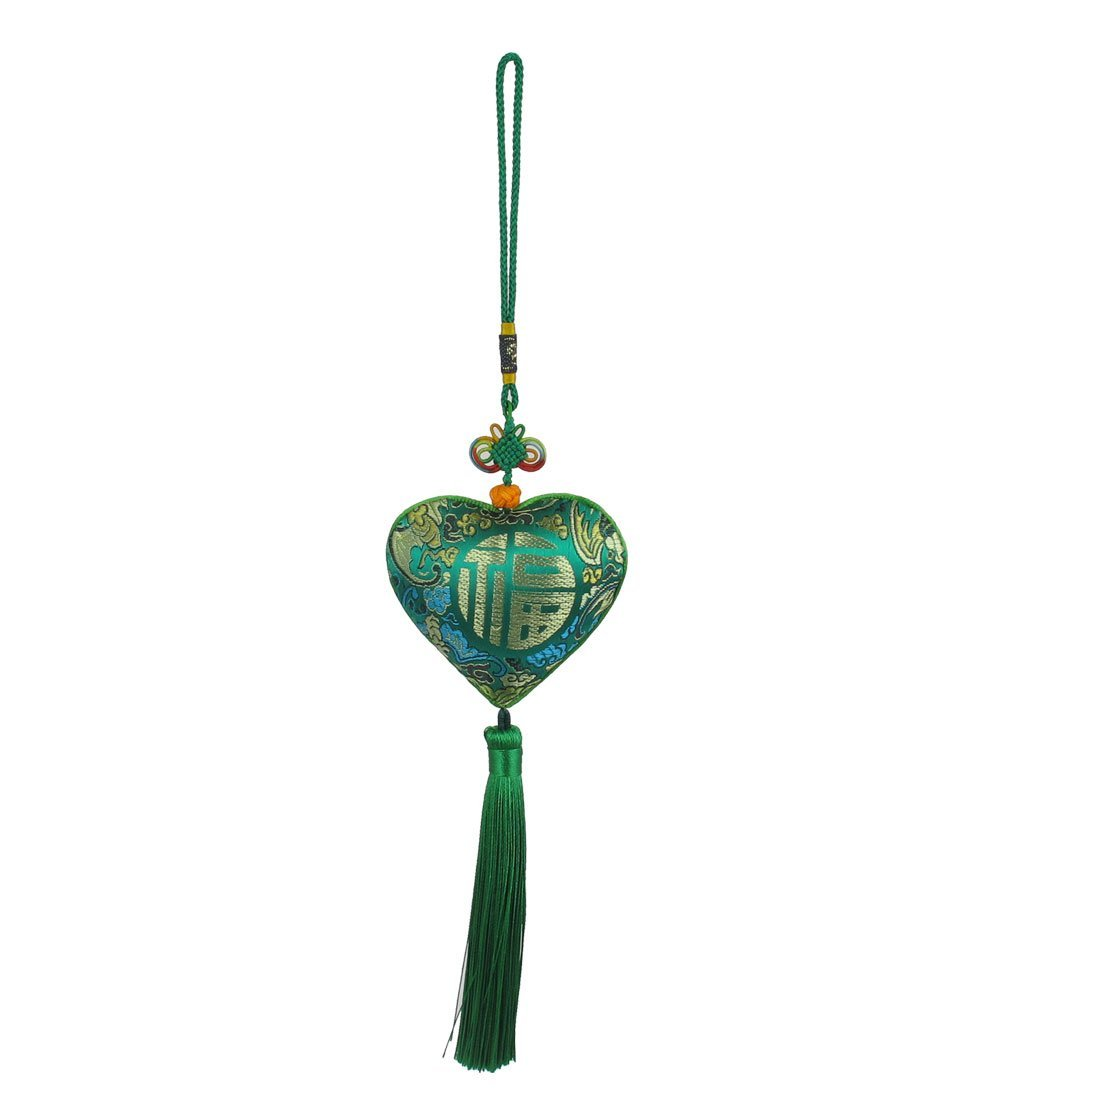 sourcingmap Heart-shape Fu Letter Print Chinese Herb Sachet Car Hang Decor Green a15092900ux0023